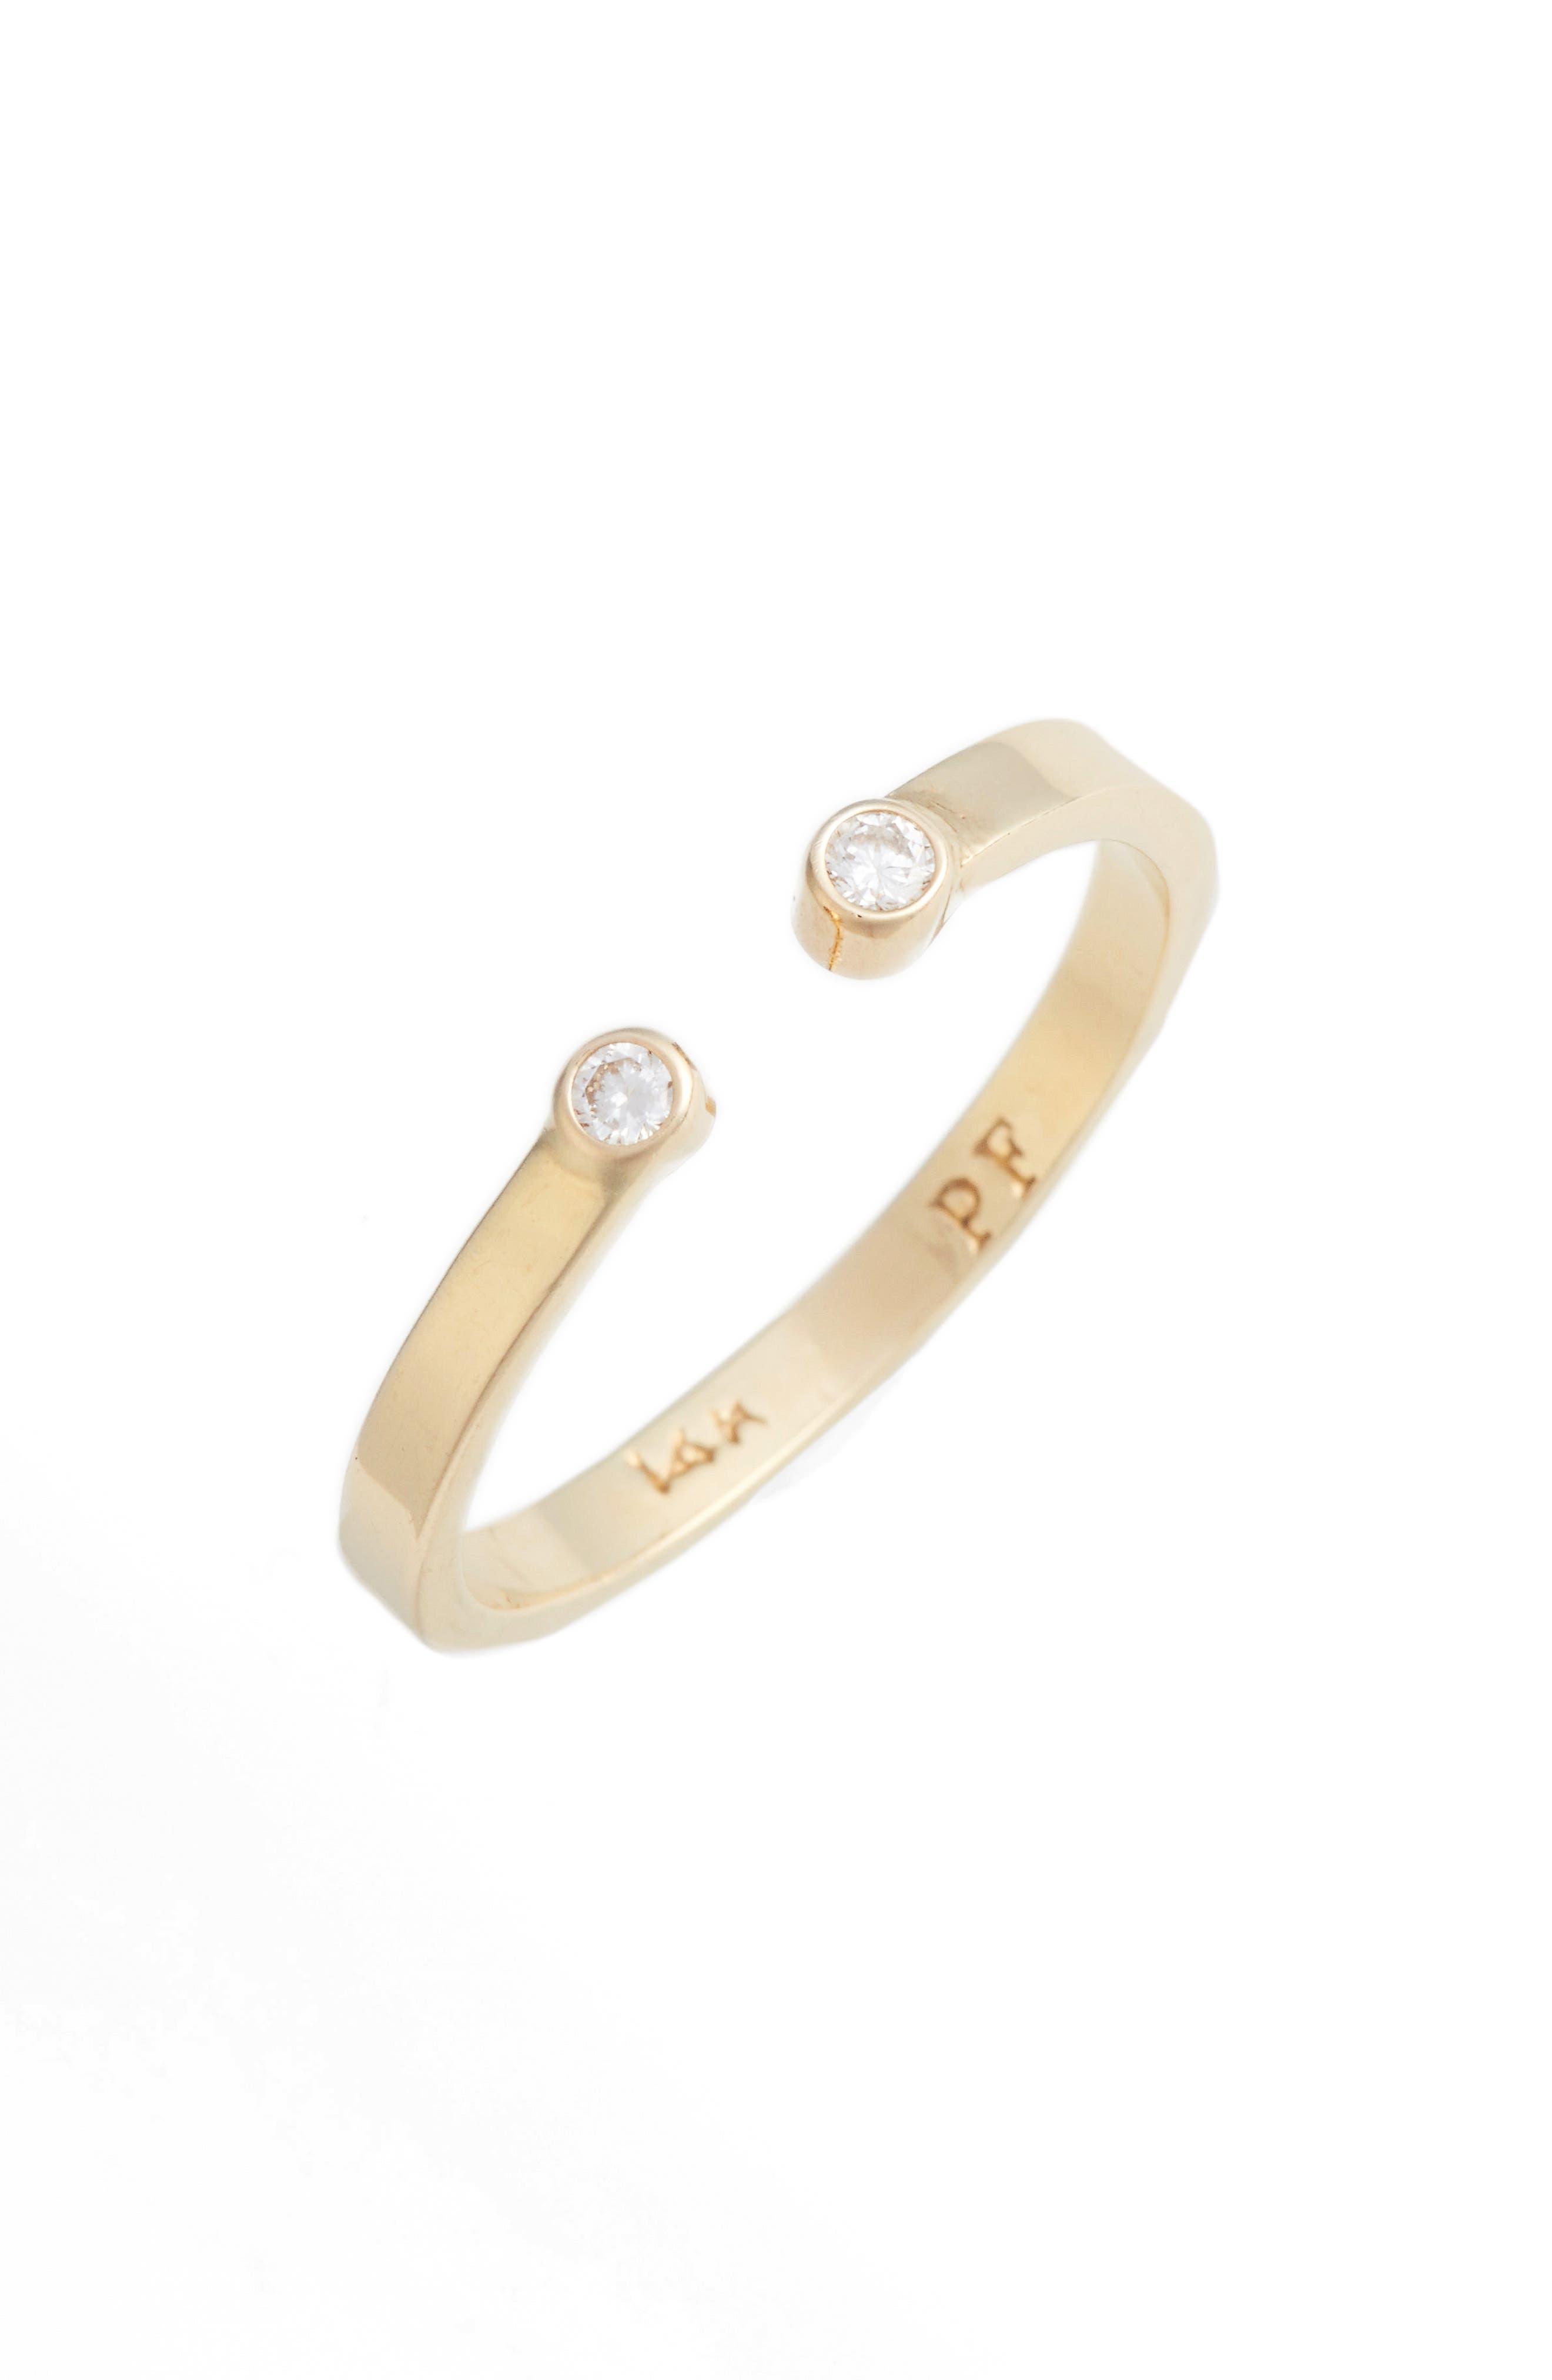 Poppy Finch Open Band Diamond Ring